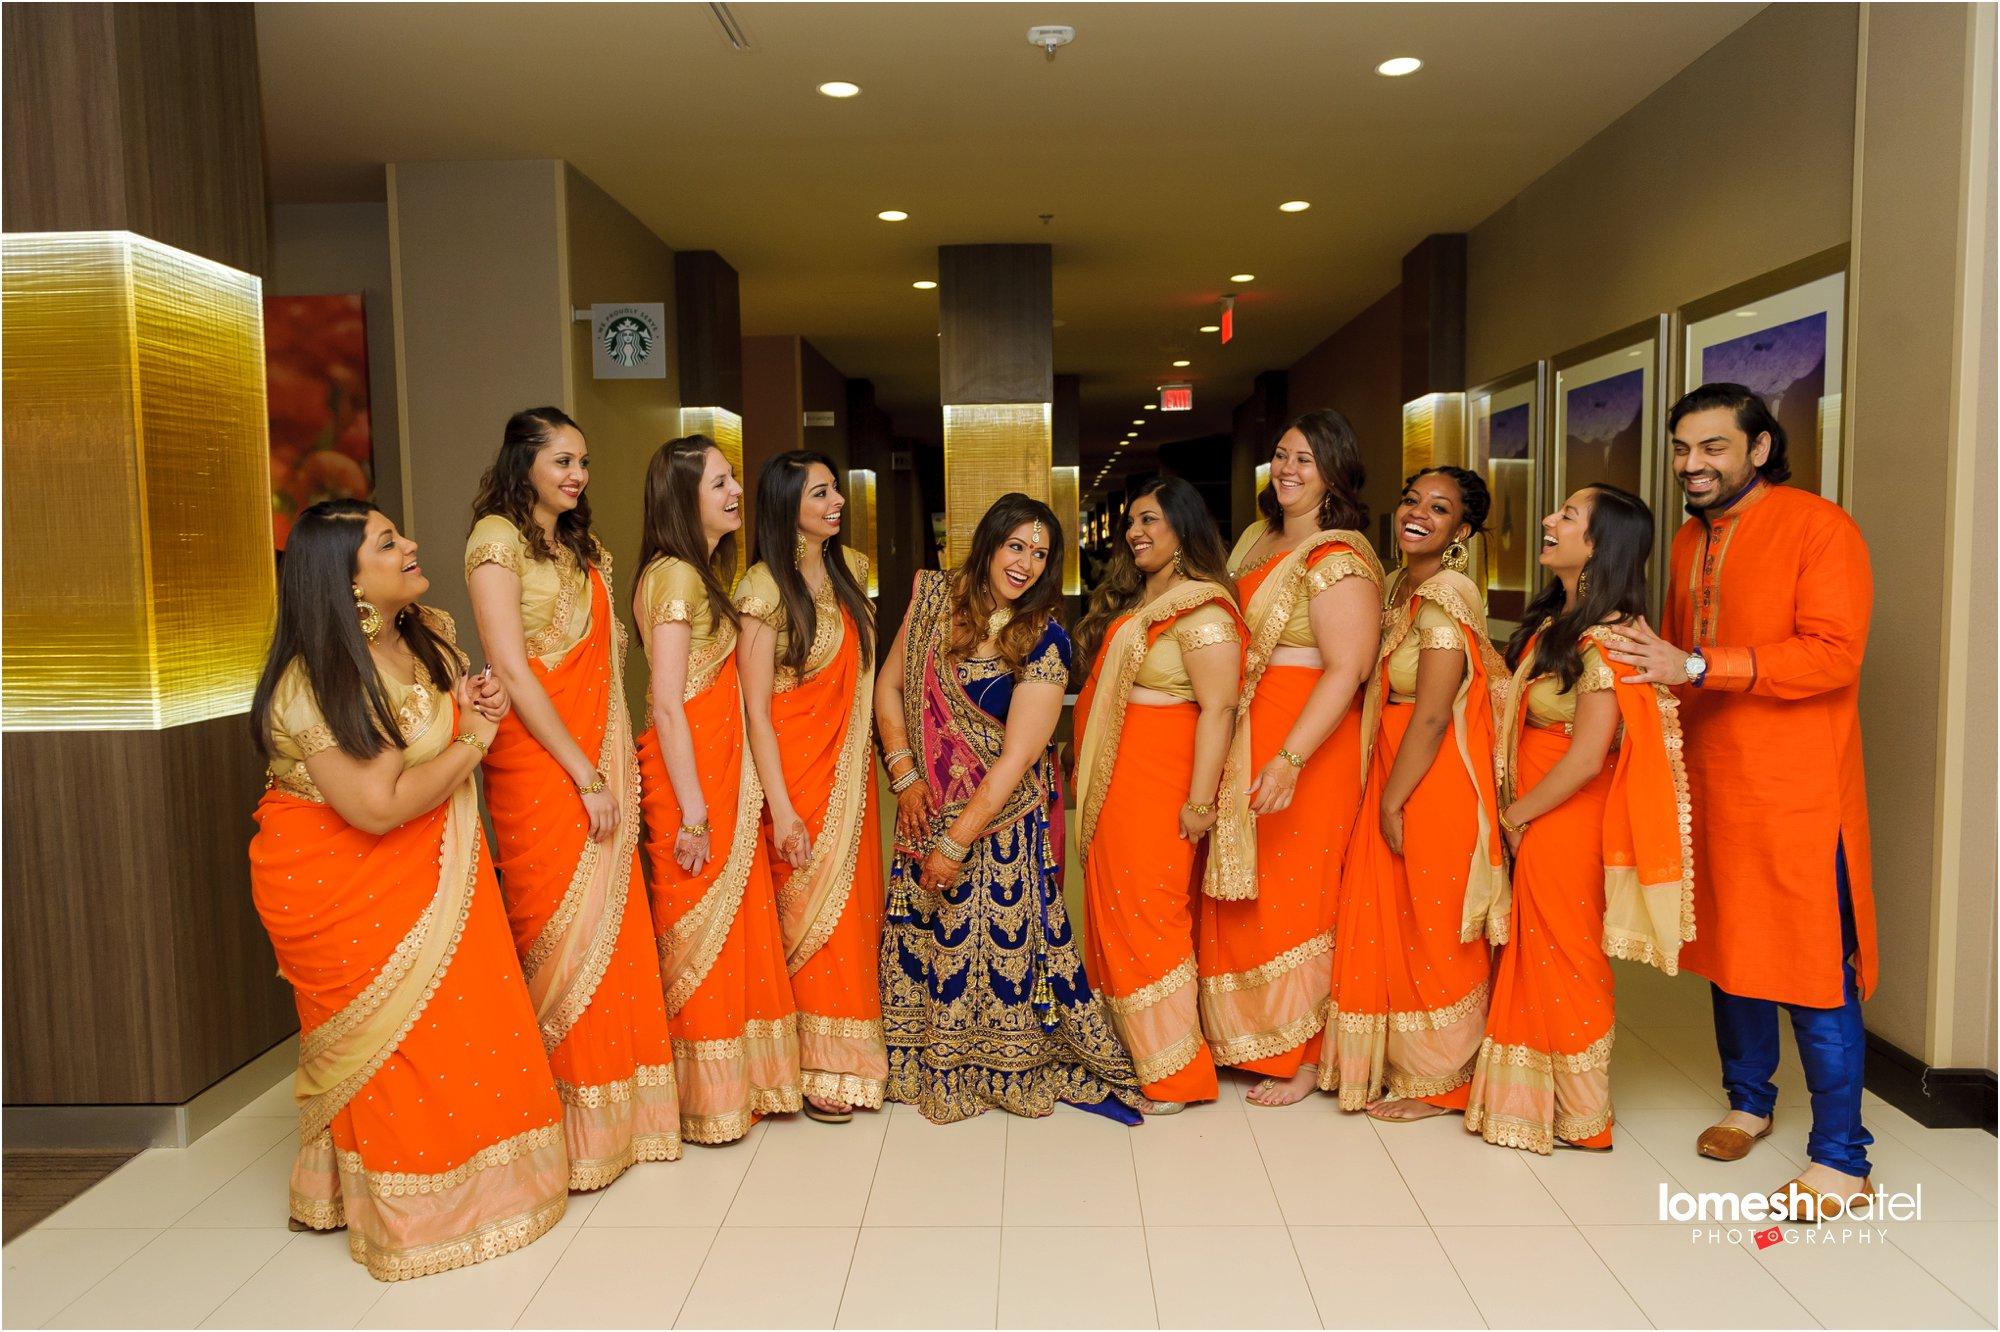 dallas_indian_wedding_0051.jpg